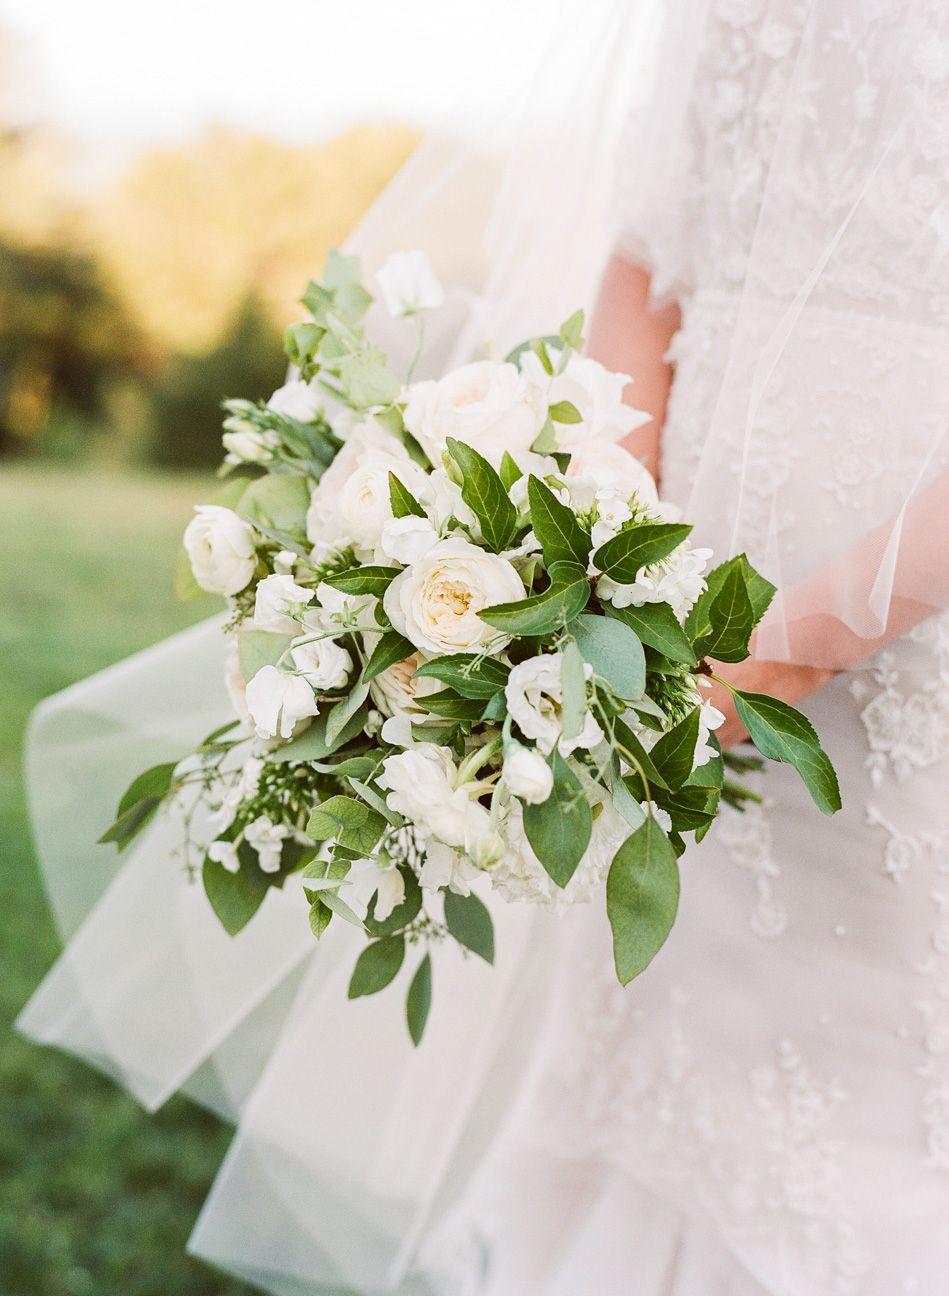 KarenHillPhotography-Parizat-Wedding-0484.jpg